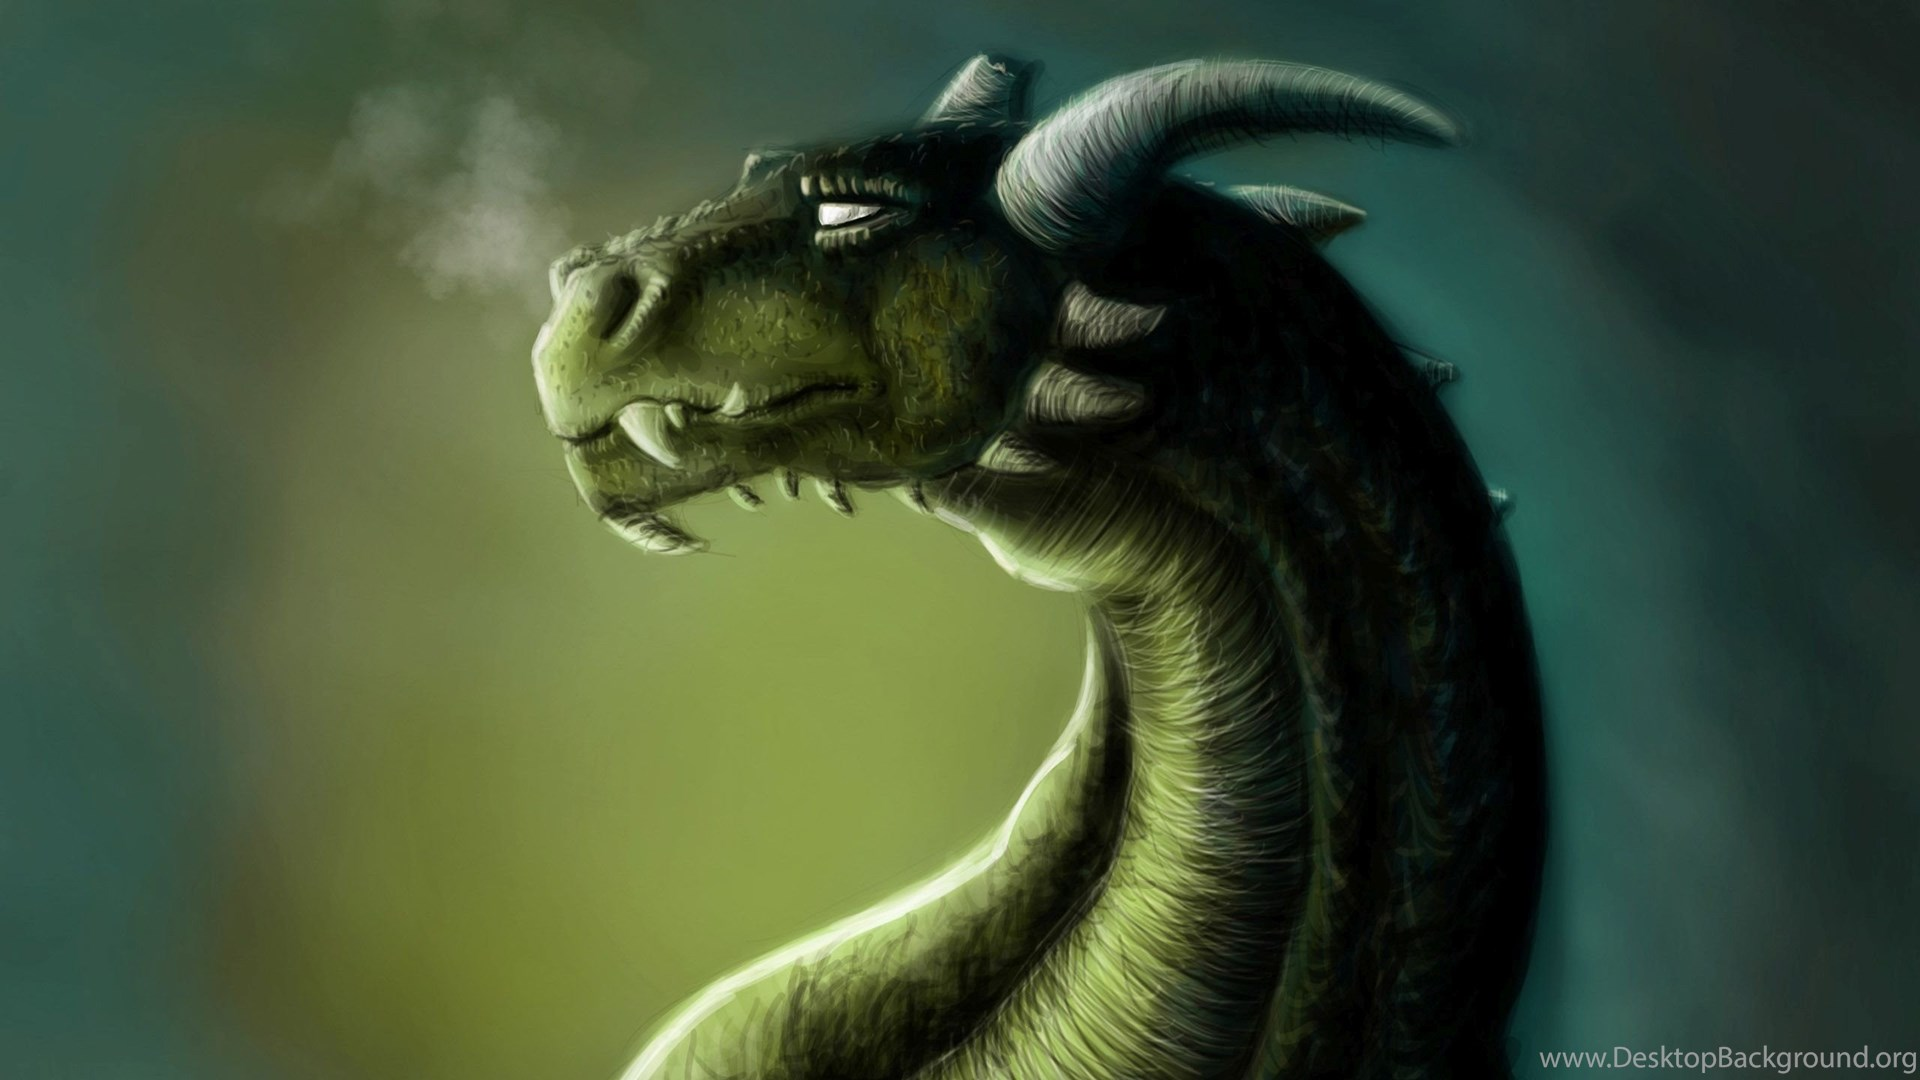 Dragon Desktop Wallpapers Desktop Background